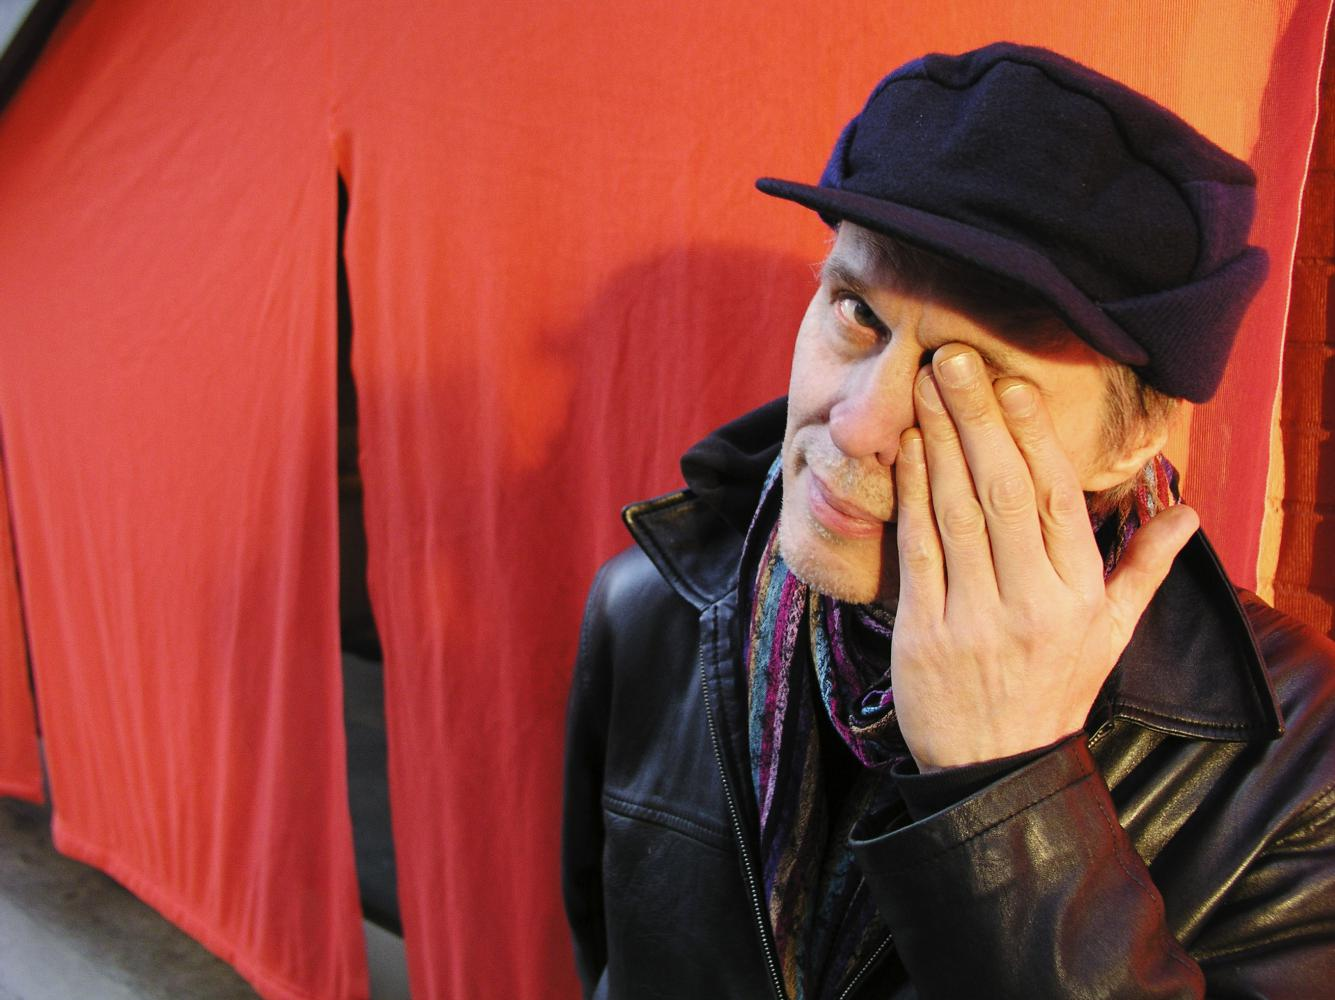 Tom Verlaine, performer, photo by Stefano Giovannini